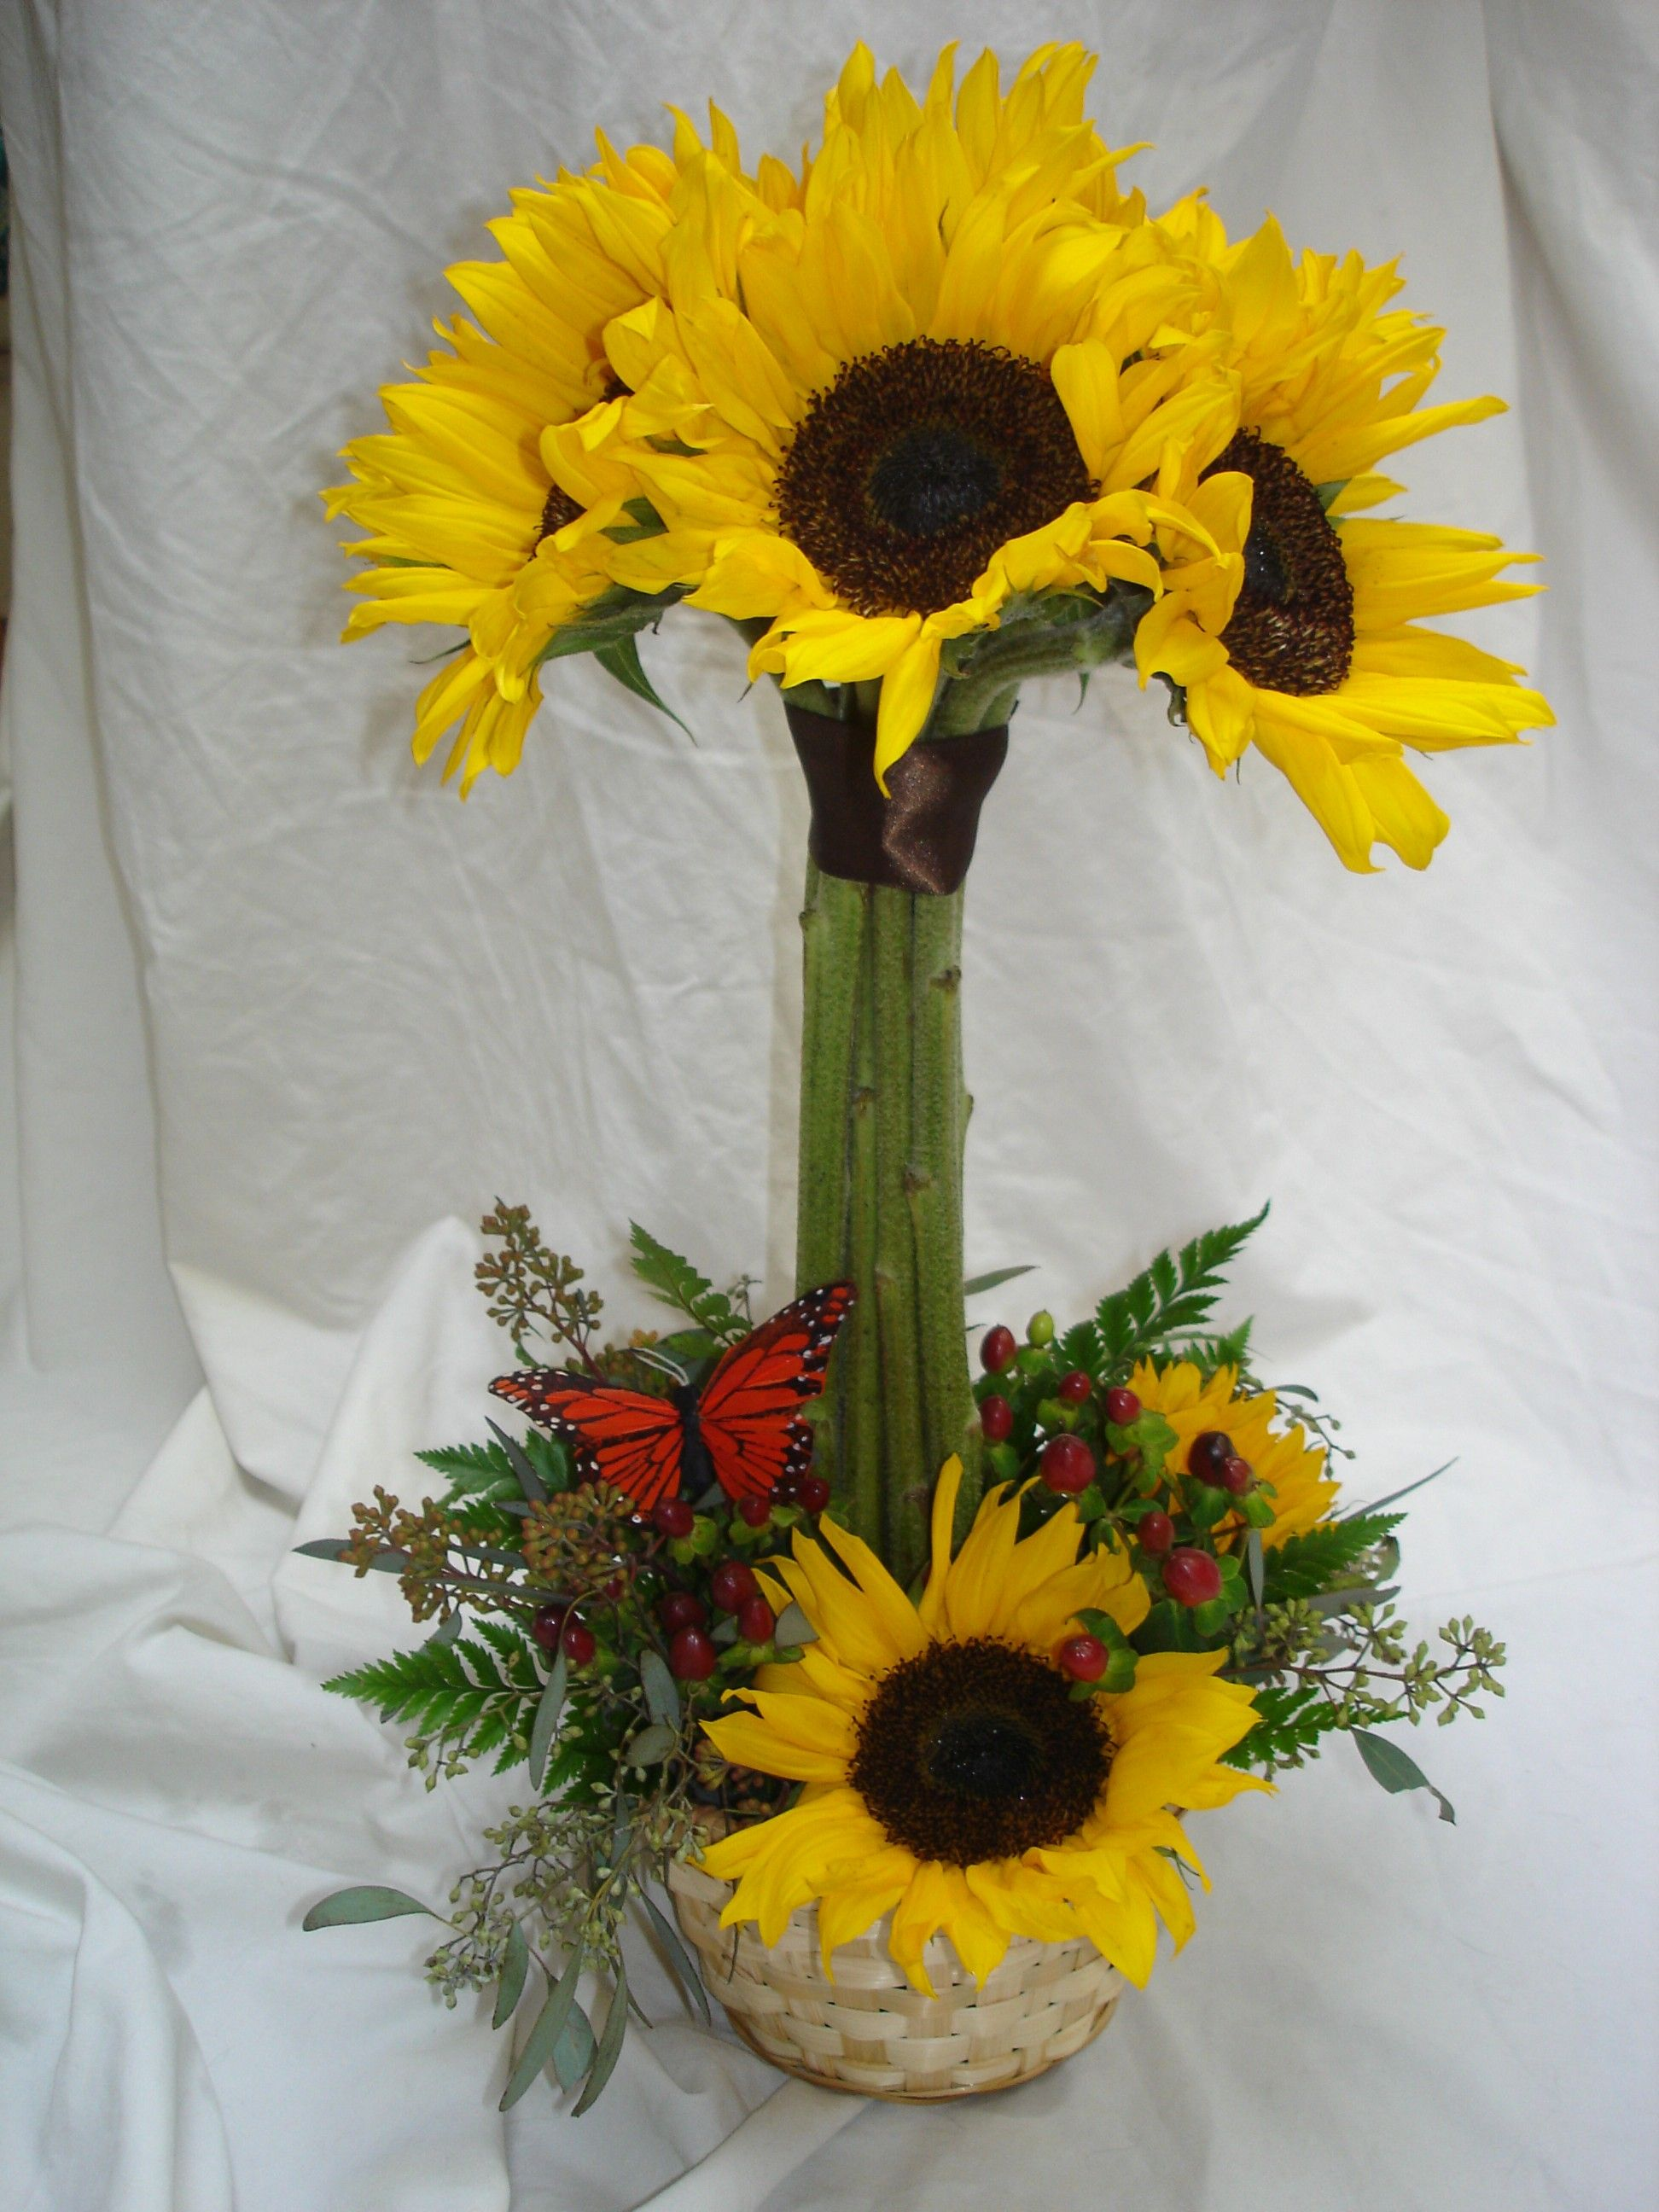 Daisy flower arrangement centerpieces sunflower topiary daisy flower arrangement centerpieces sunflower topiary centerpieces wedding izmirmasajfo